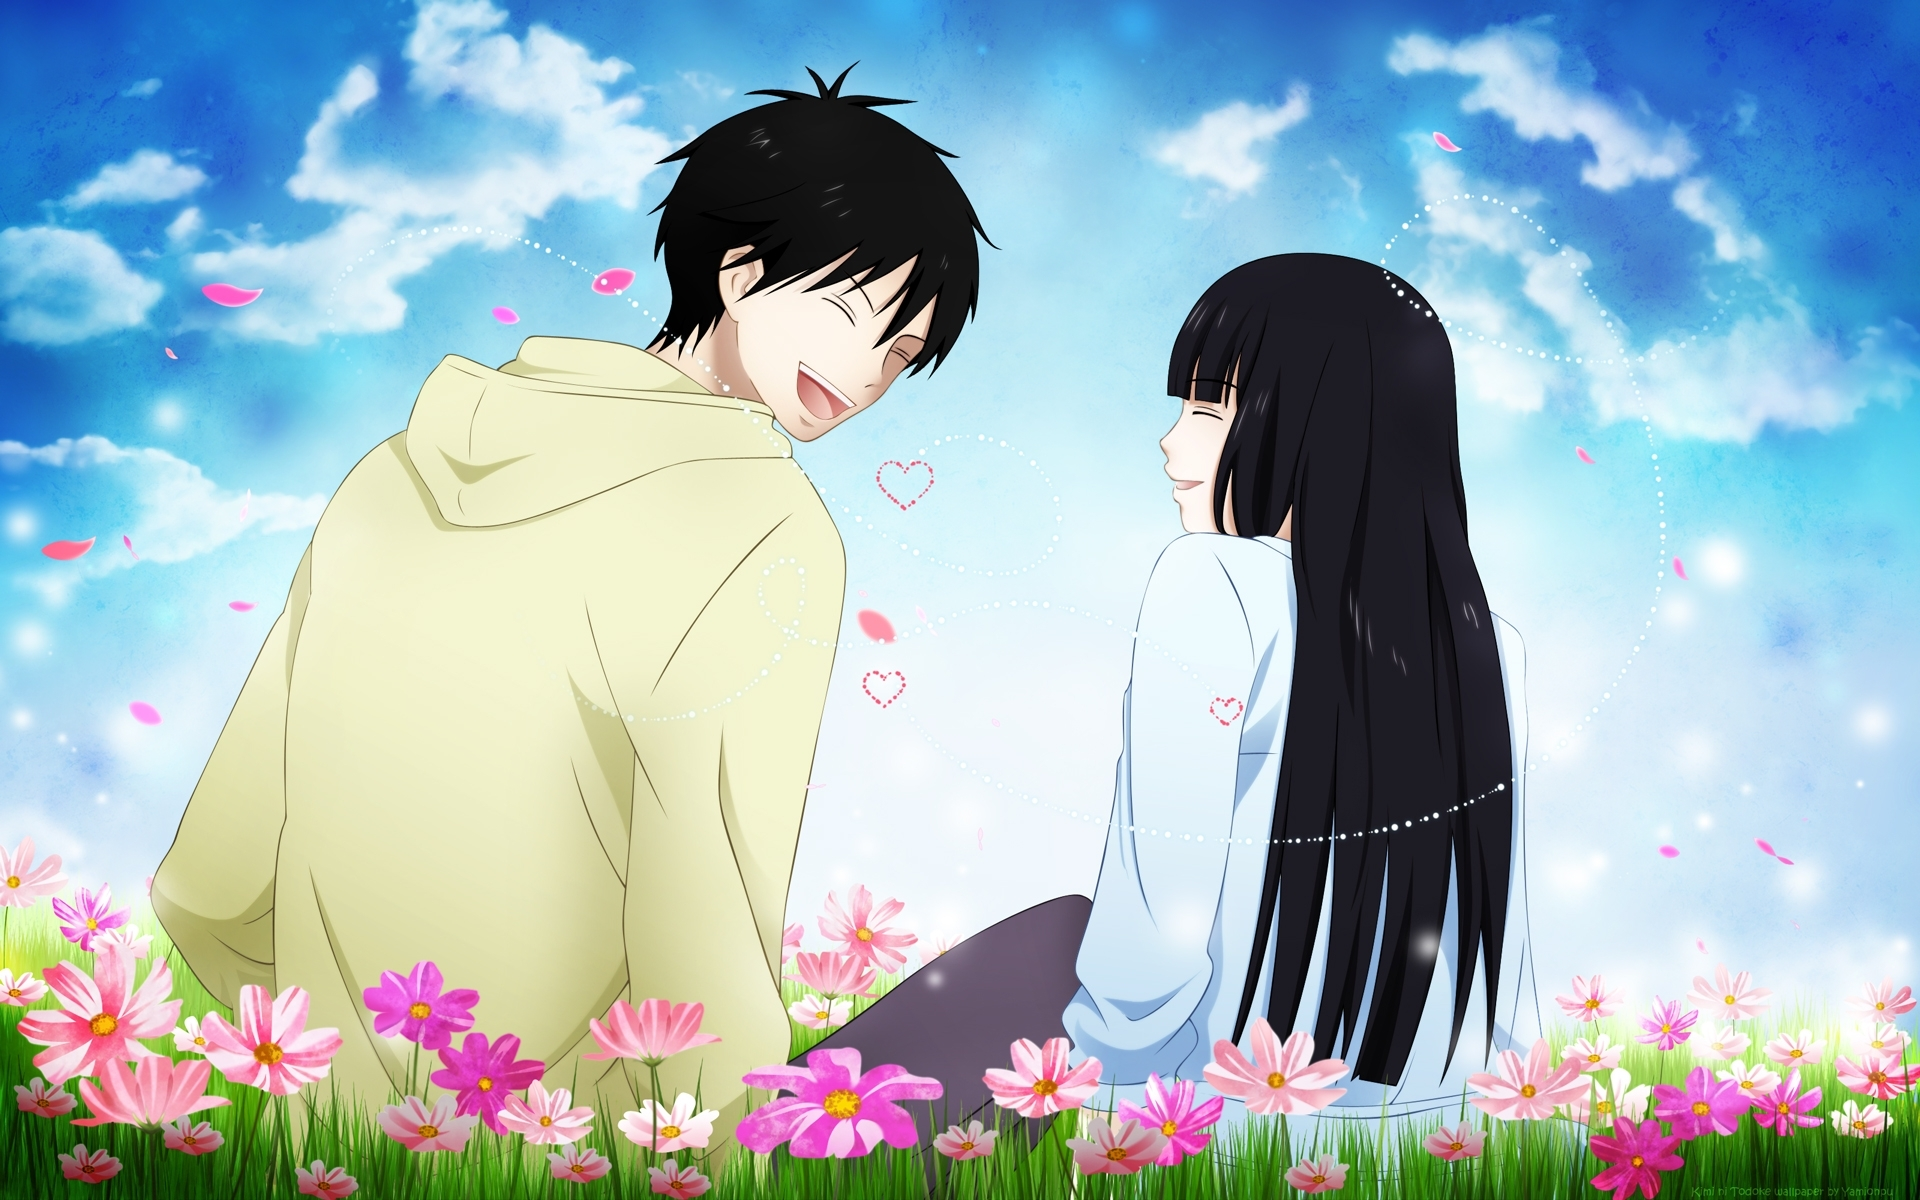 kimi ni todoke (from me to you) wallpaper #130787 - zerochan anime